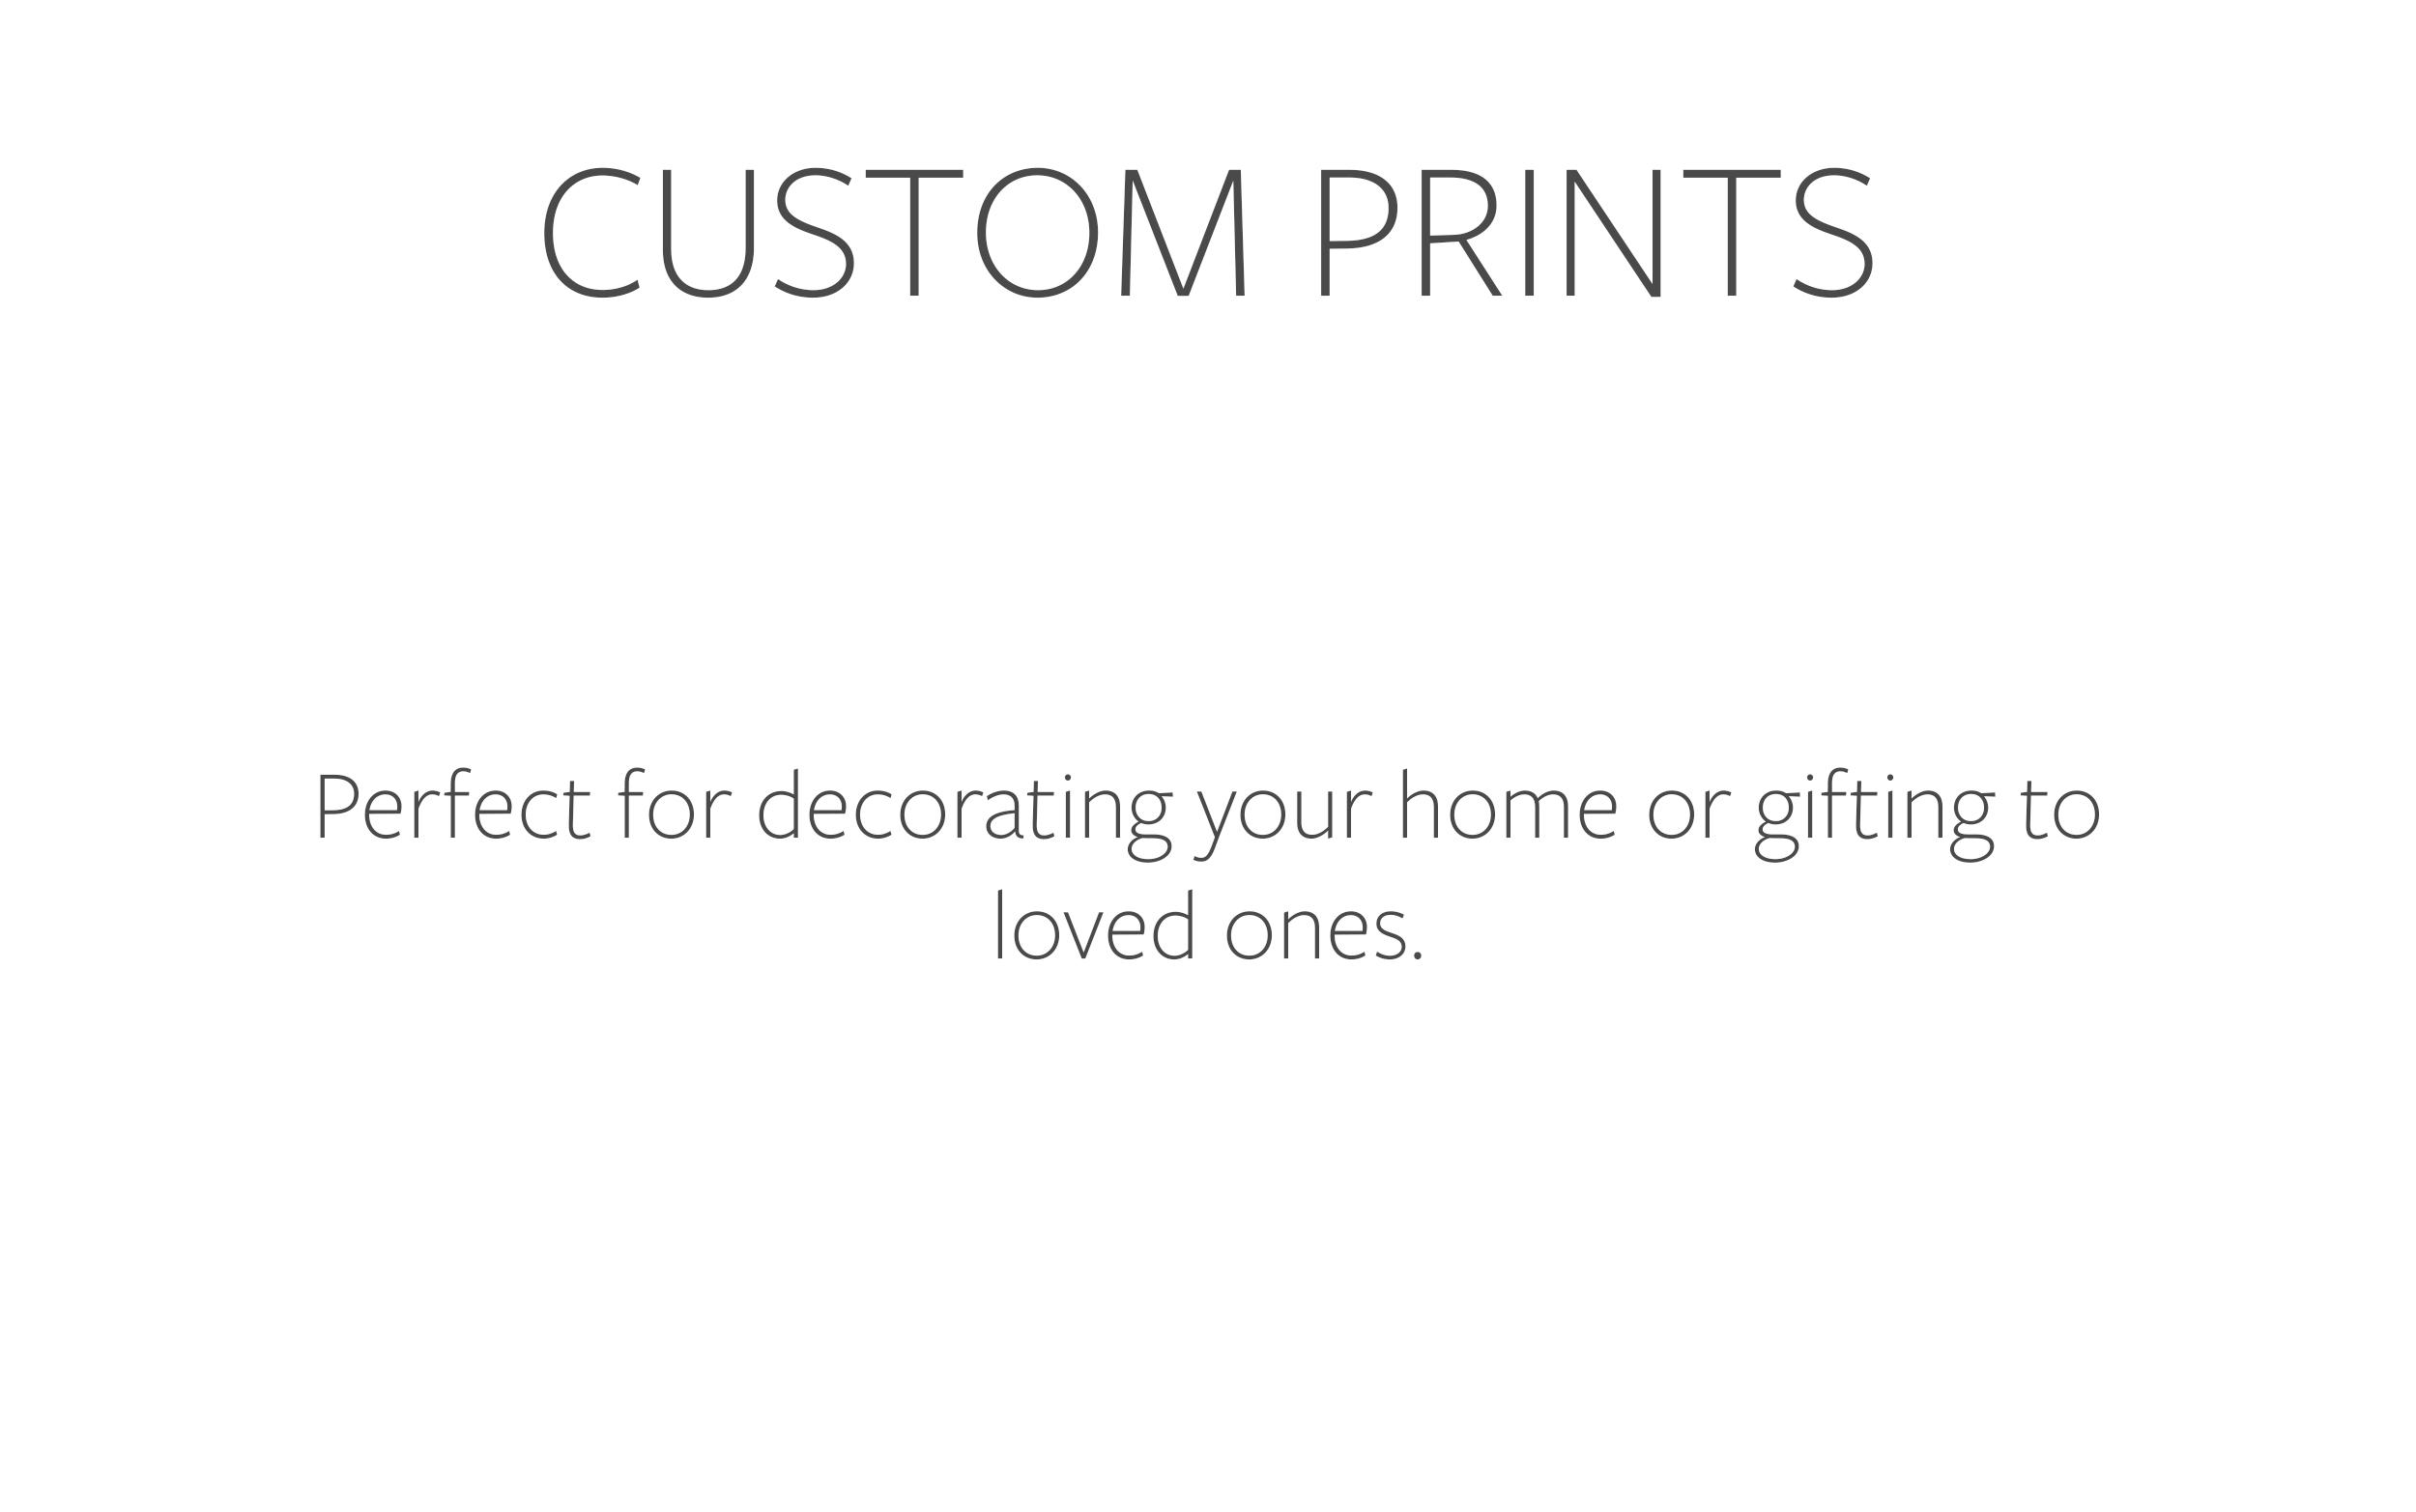 CustomPrints-Services-Calligraphy-TrueNorthPaperCo.jpg